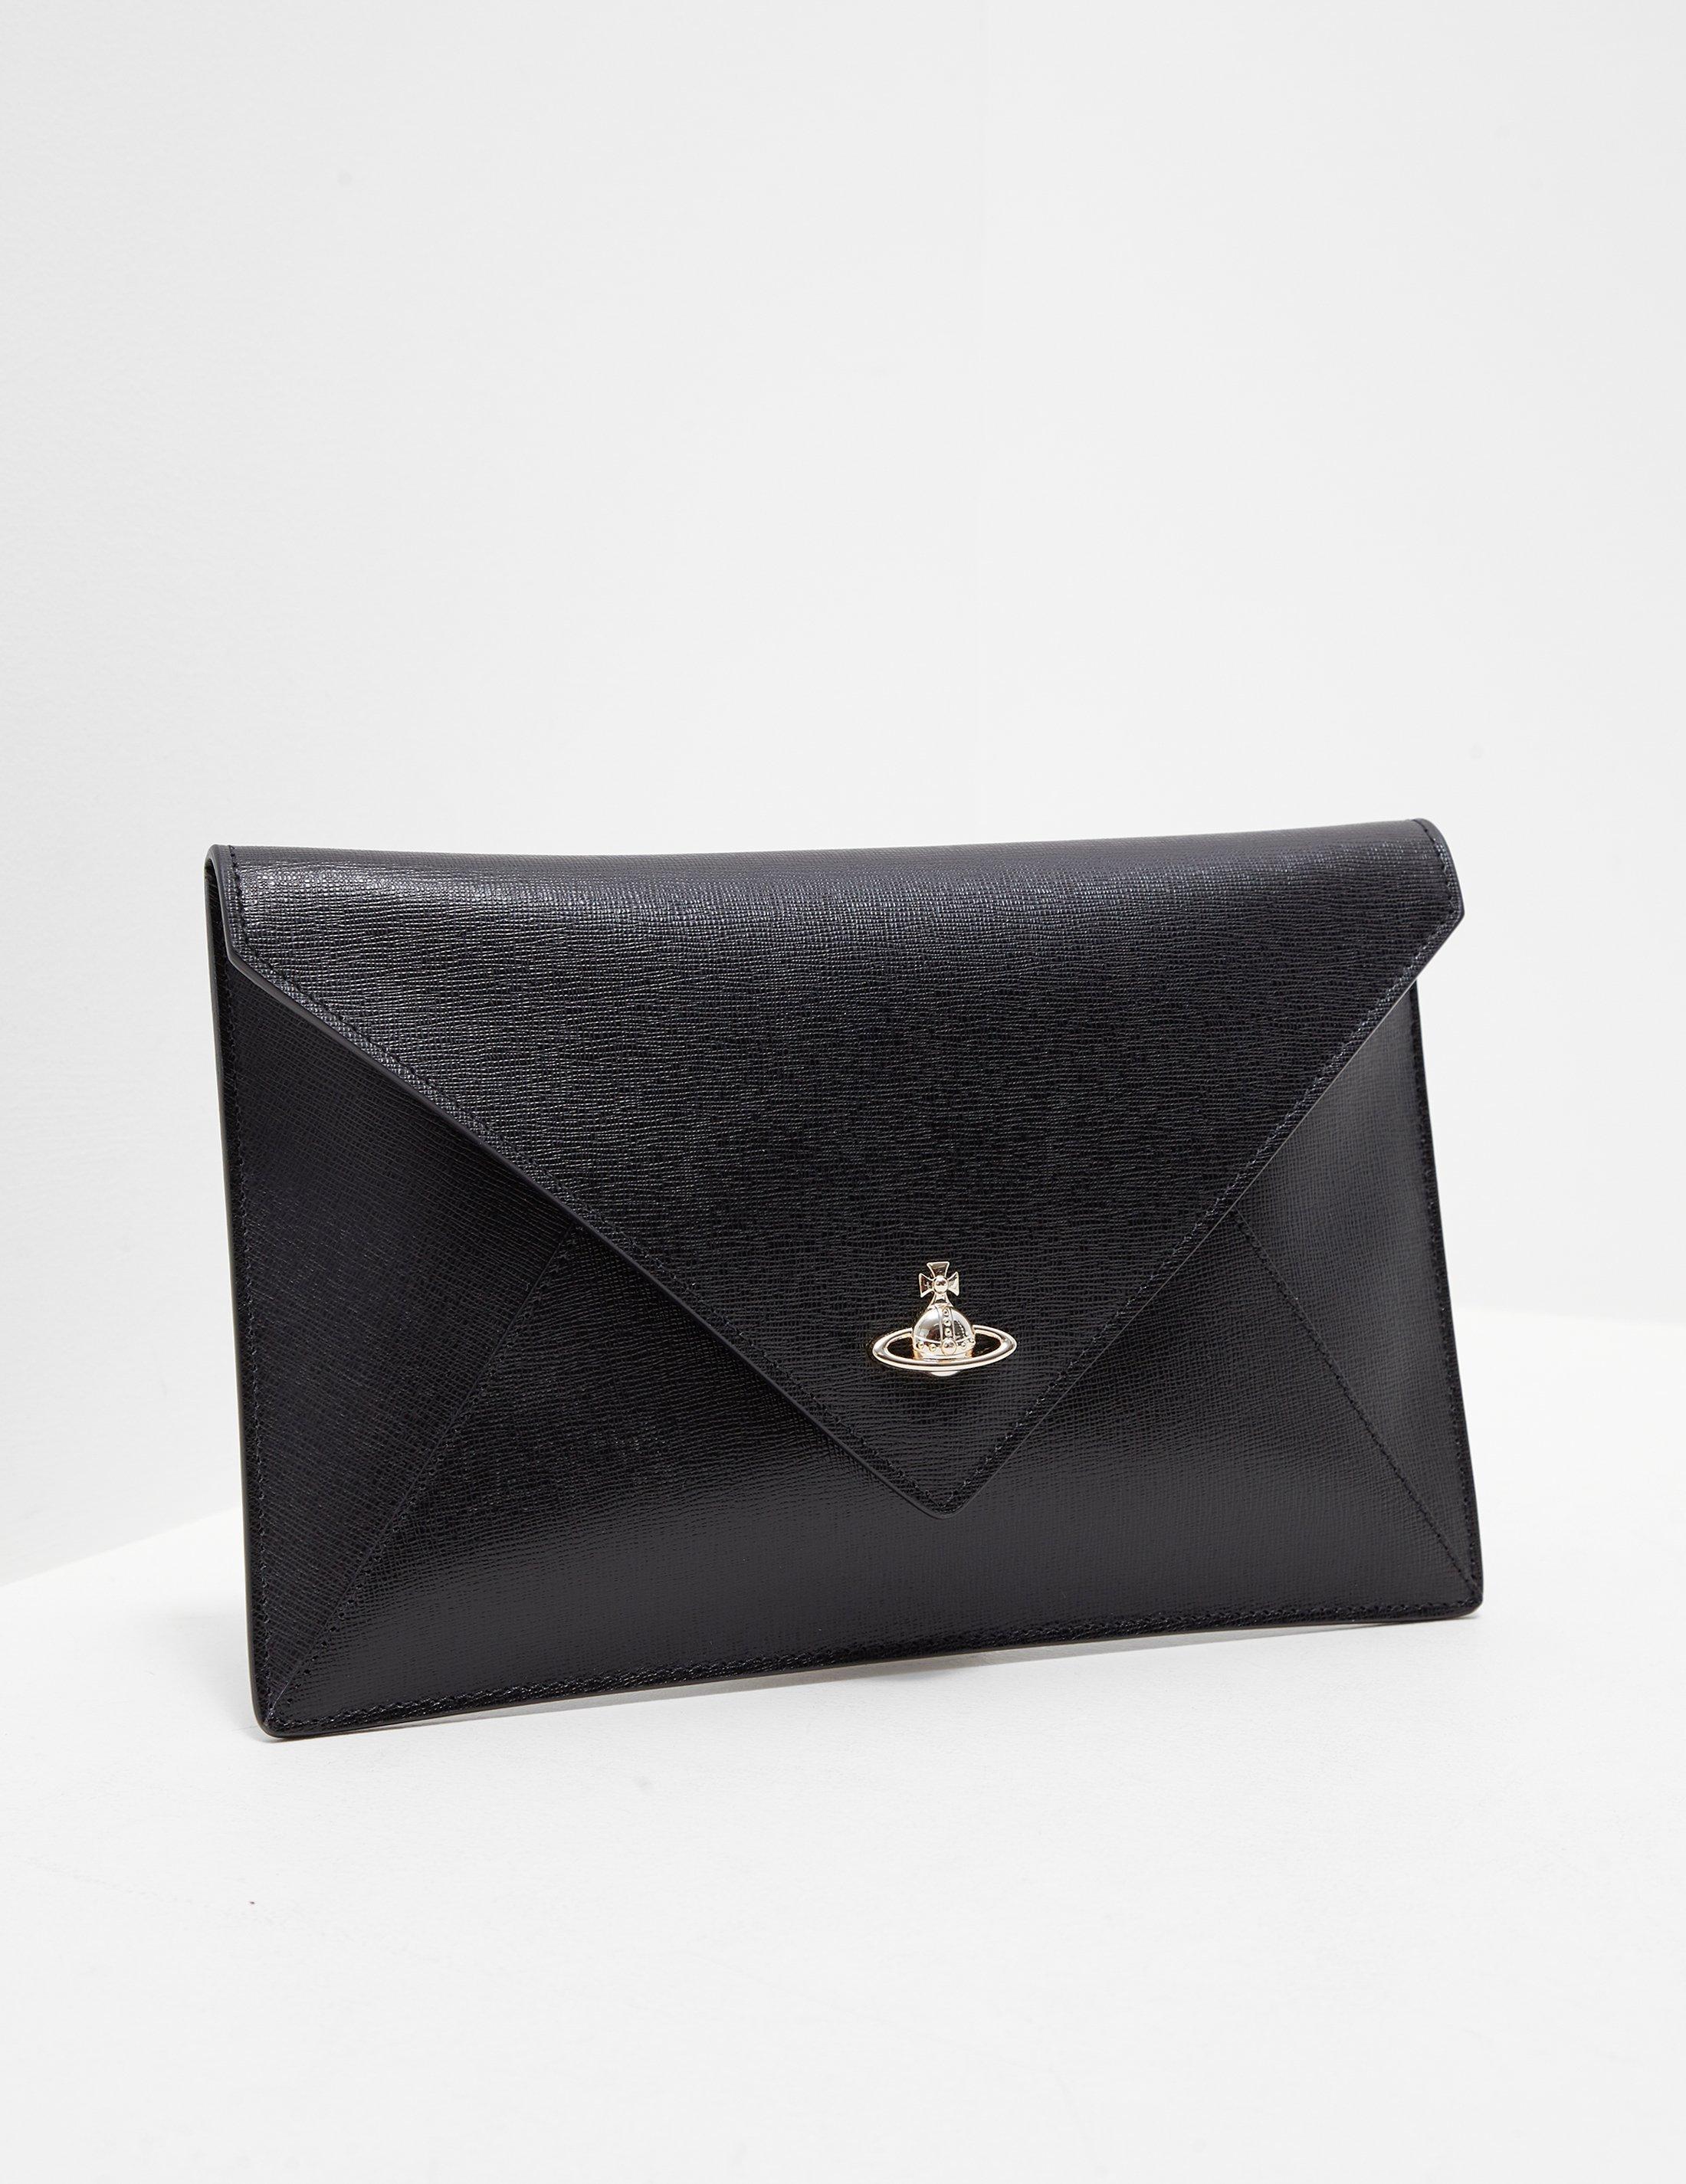 Ben noto Vivienne Westwood Bags - Women | Tessuti RV14